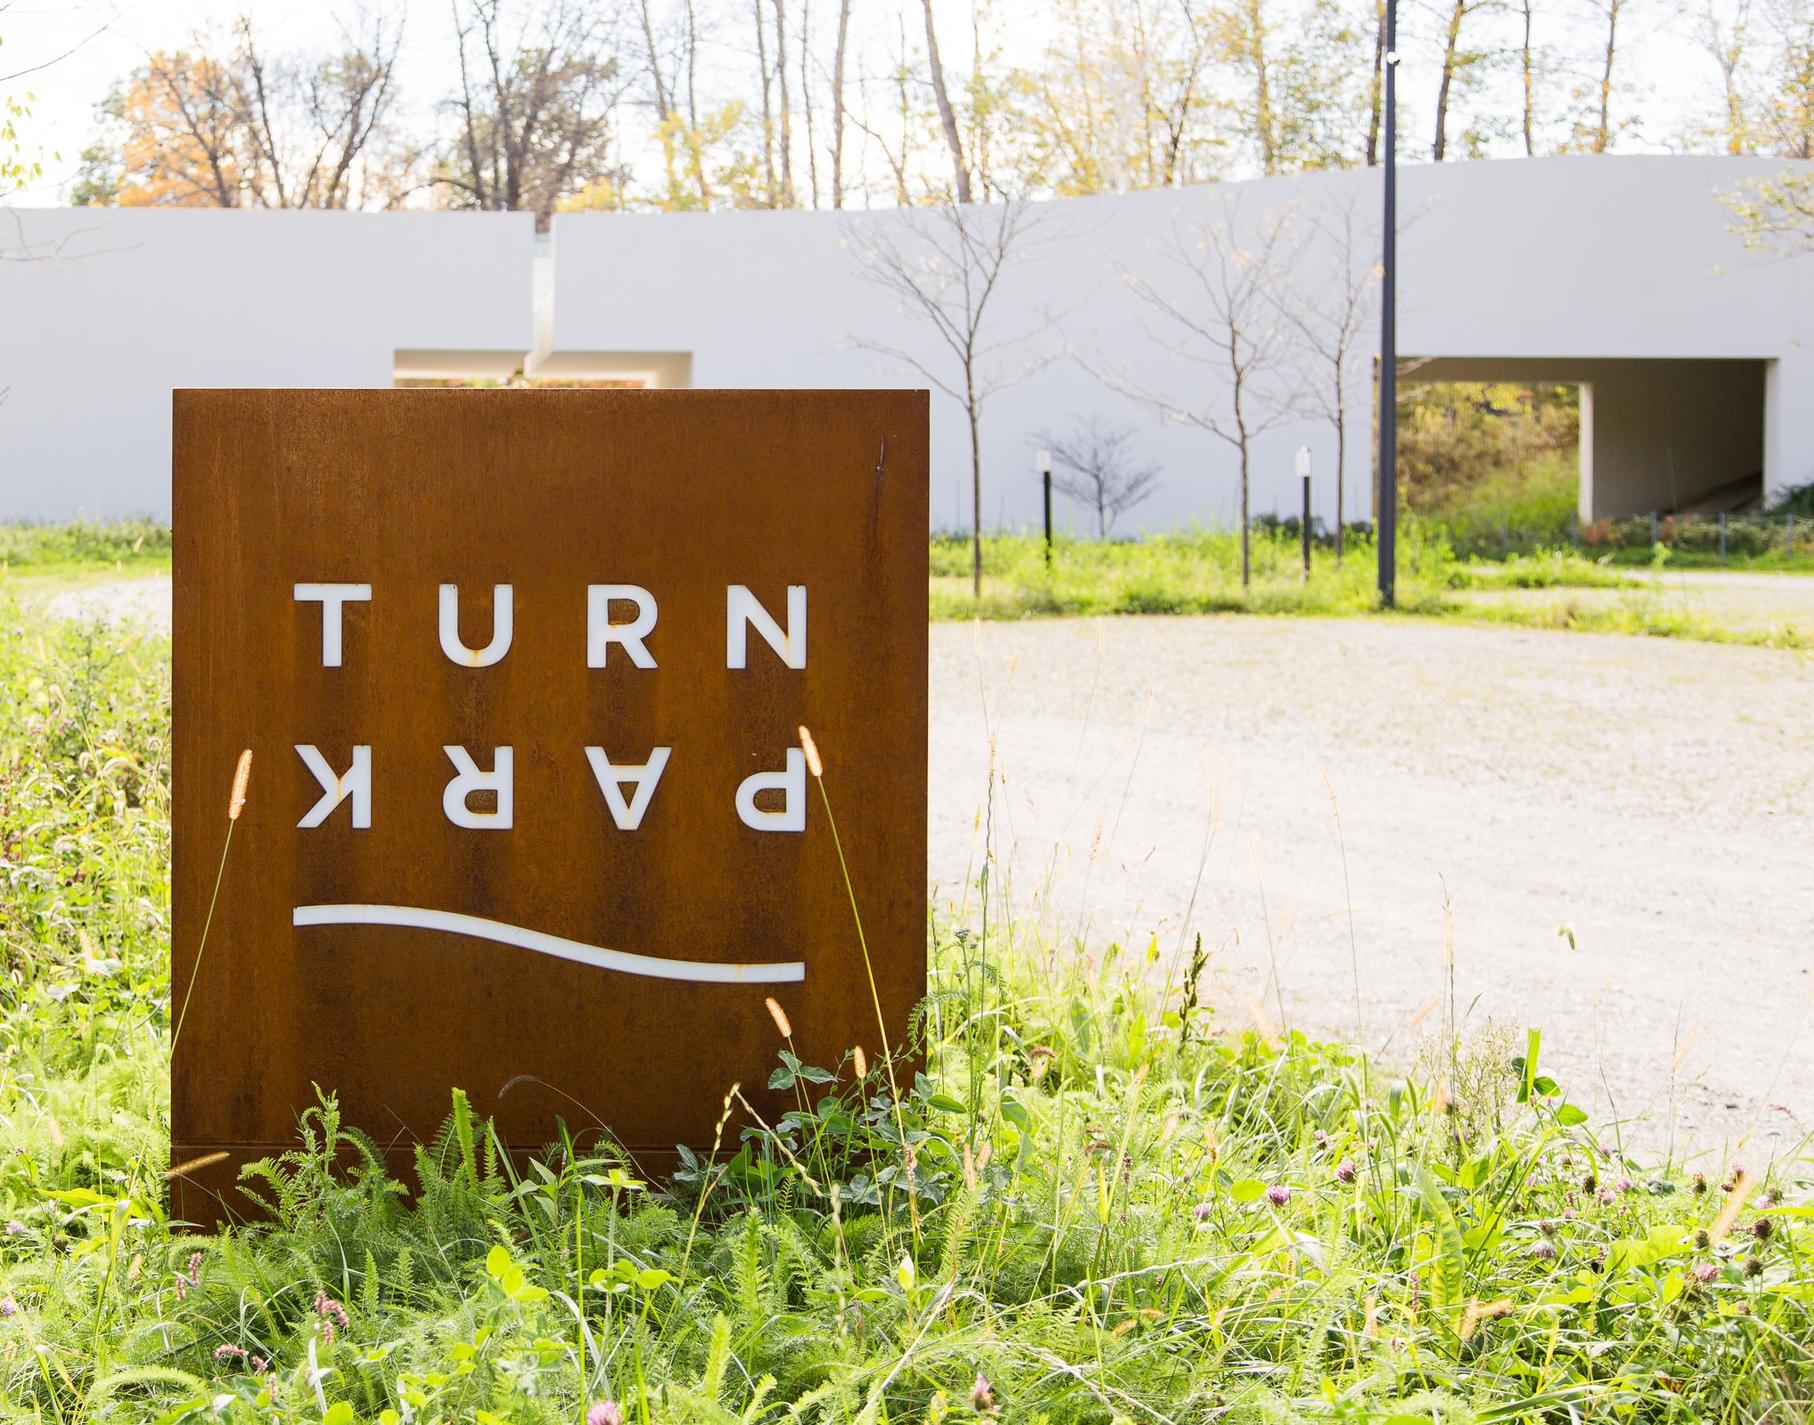 TurnPark-Fall2017-BeauBernatchezPhoto-1.jpg